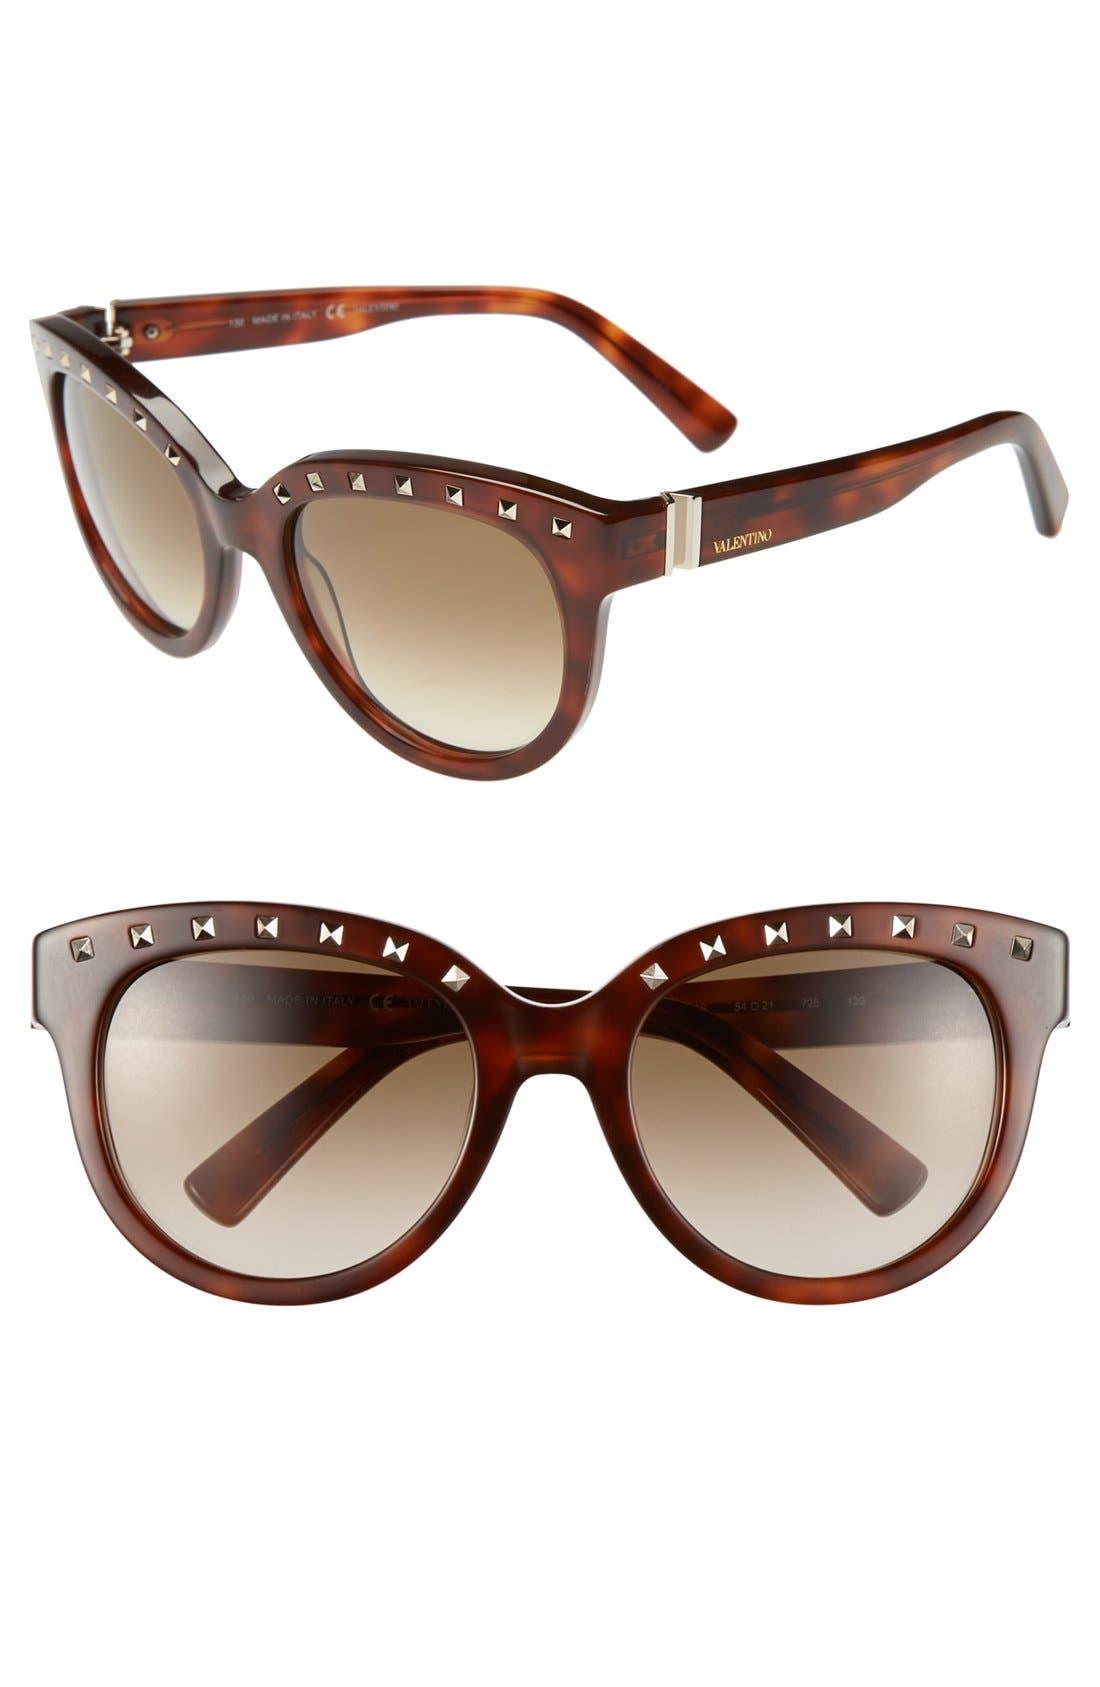 Main Image - Valentino 'Rockstud' 54mm Sunglasses